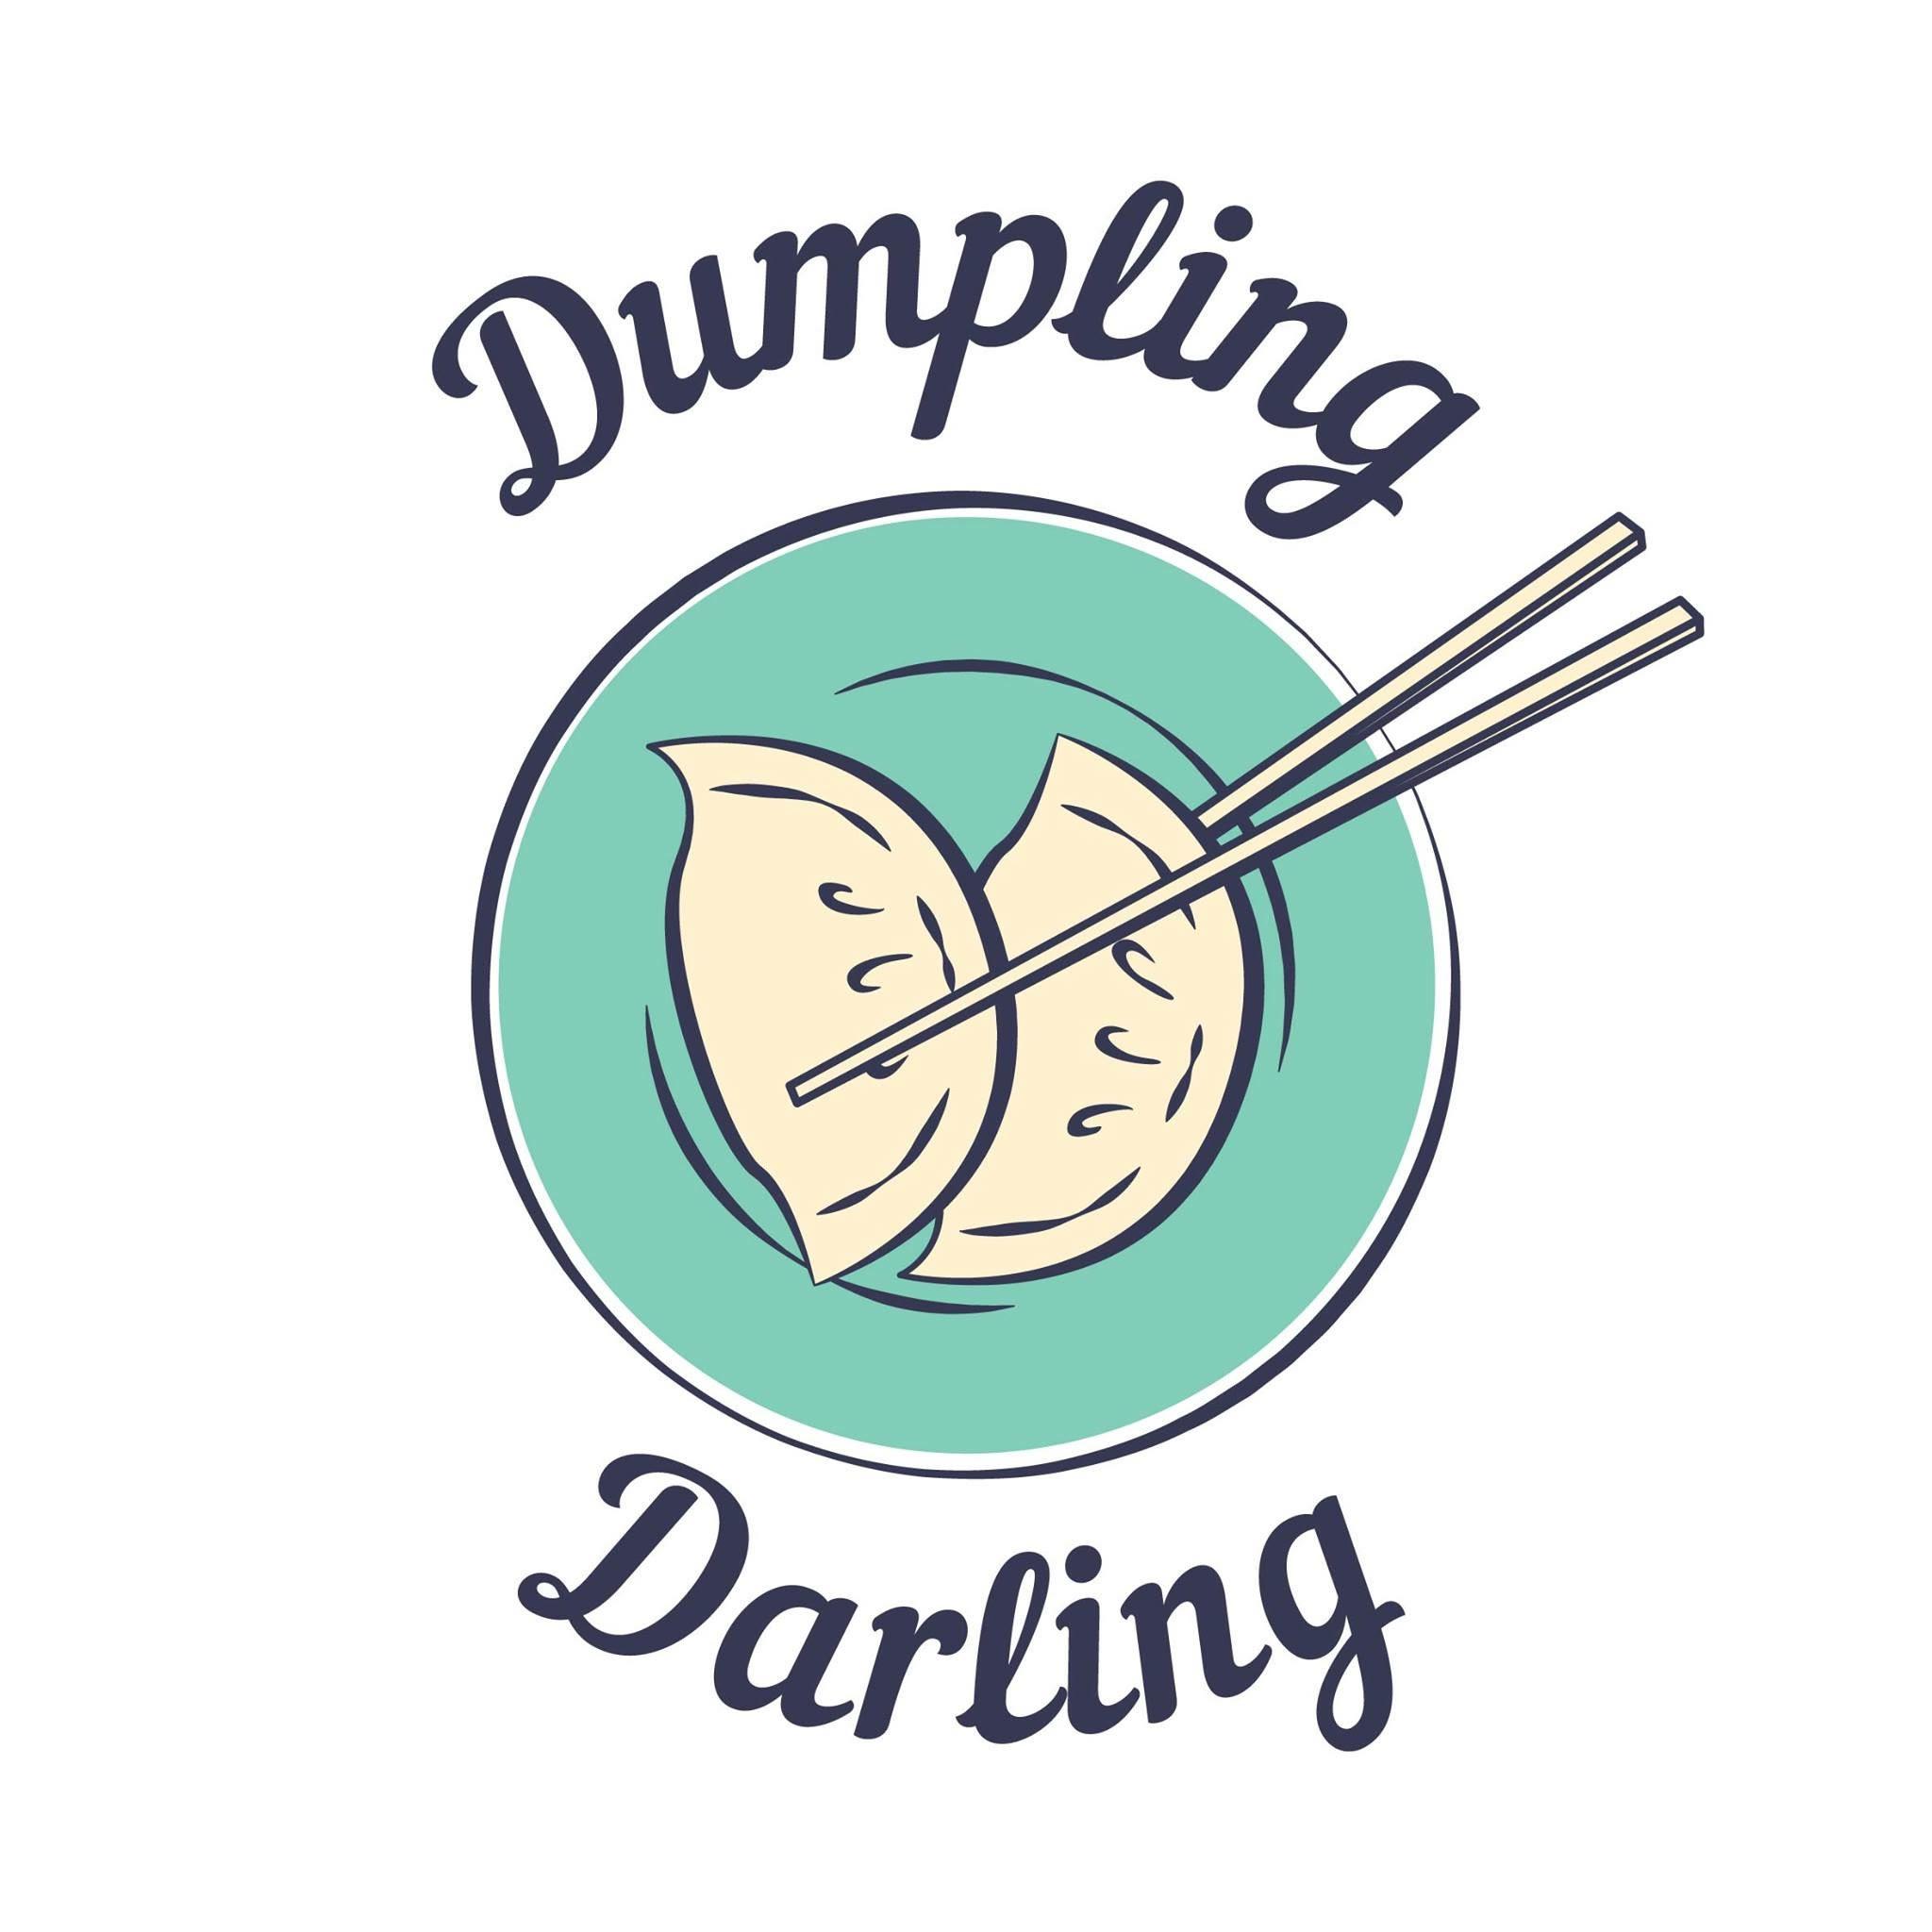 dumplingdarling2.jpg